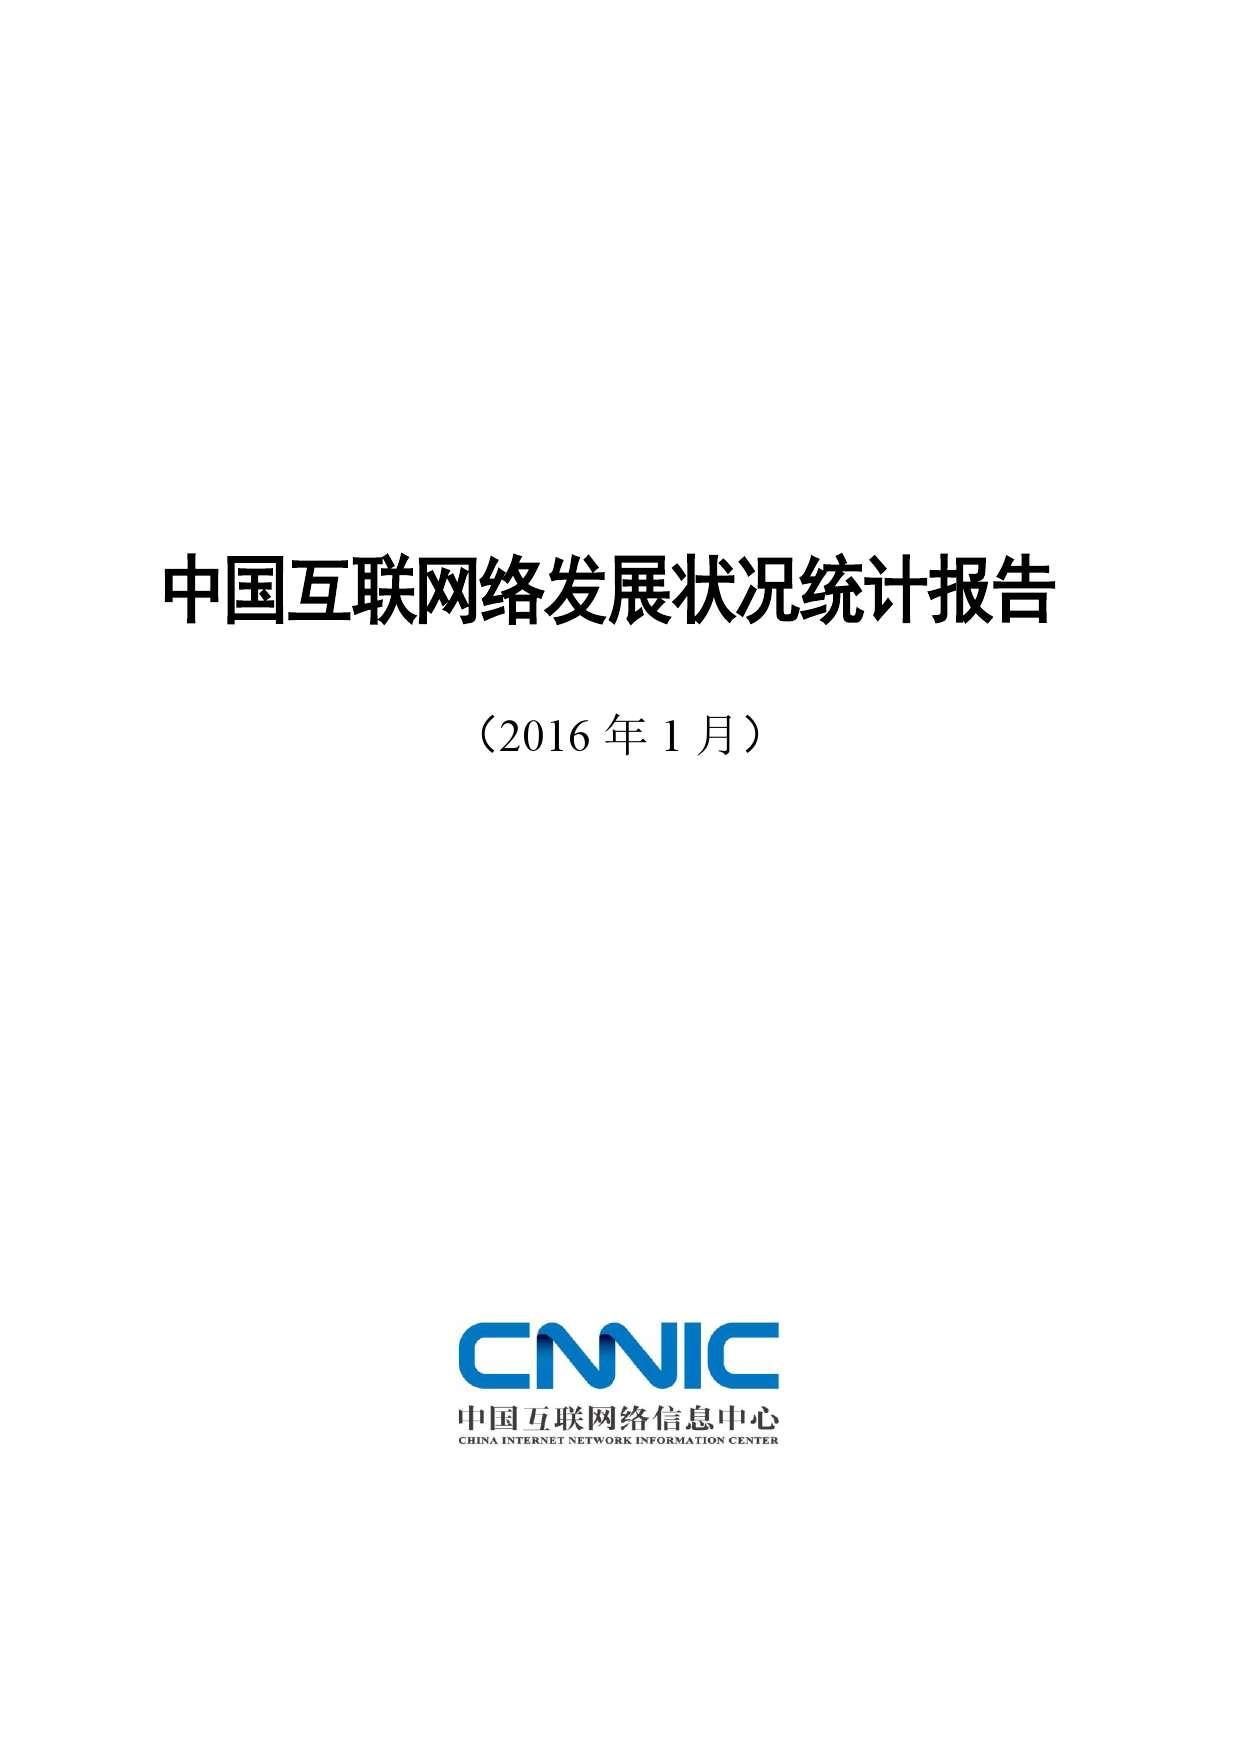 CNNIC:2015年第37次中国互联网络发展状况统计报告_000001